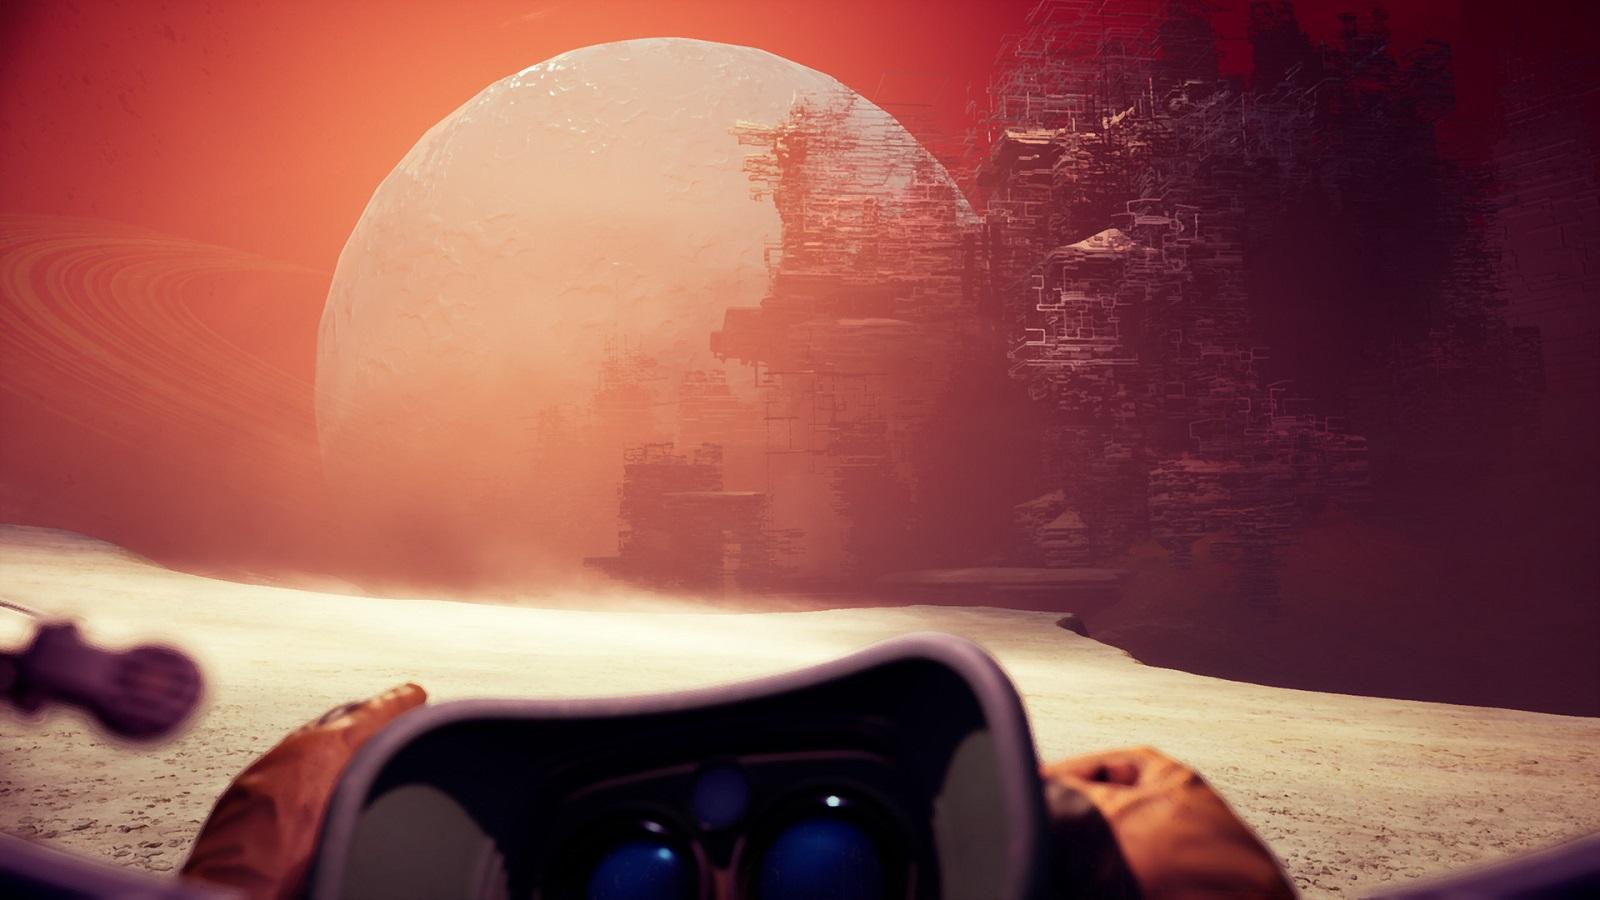 Бывшие сотрудники CD Projekt RED и Techland анонсировали приключение The Invincible по роману Станислава Лема - 05